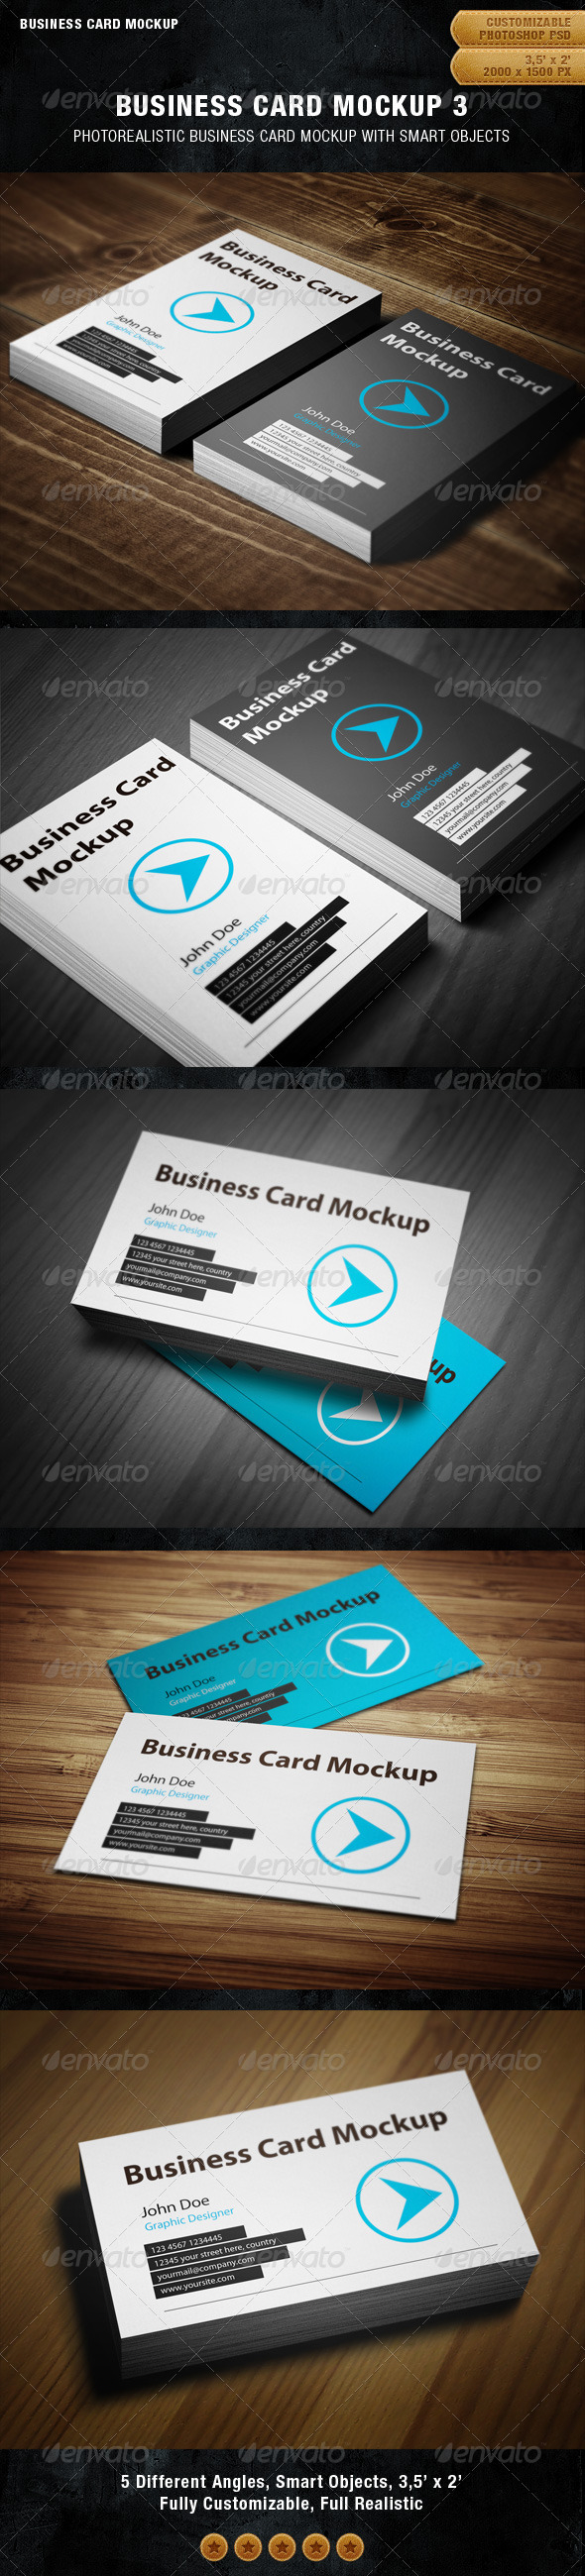 GraphicRiver Business Card Mockup 3 1927088